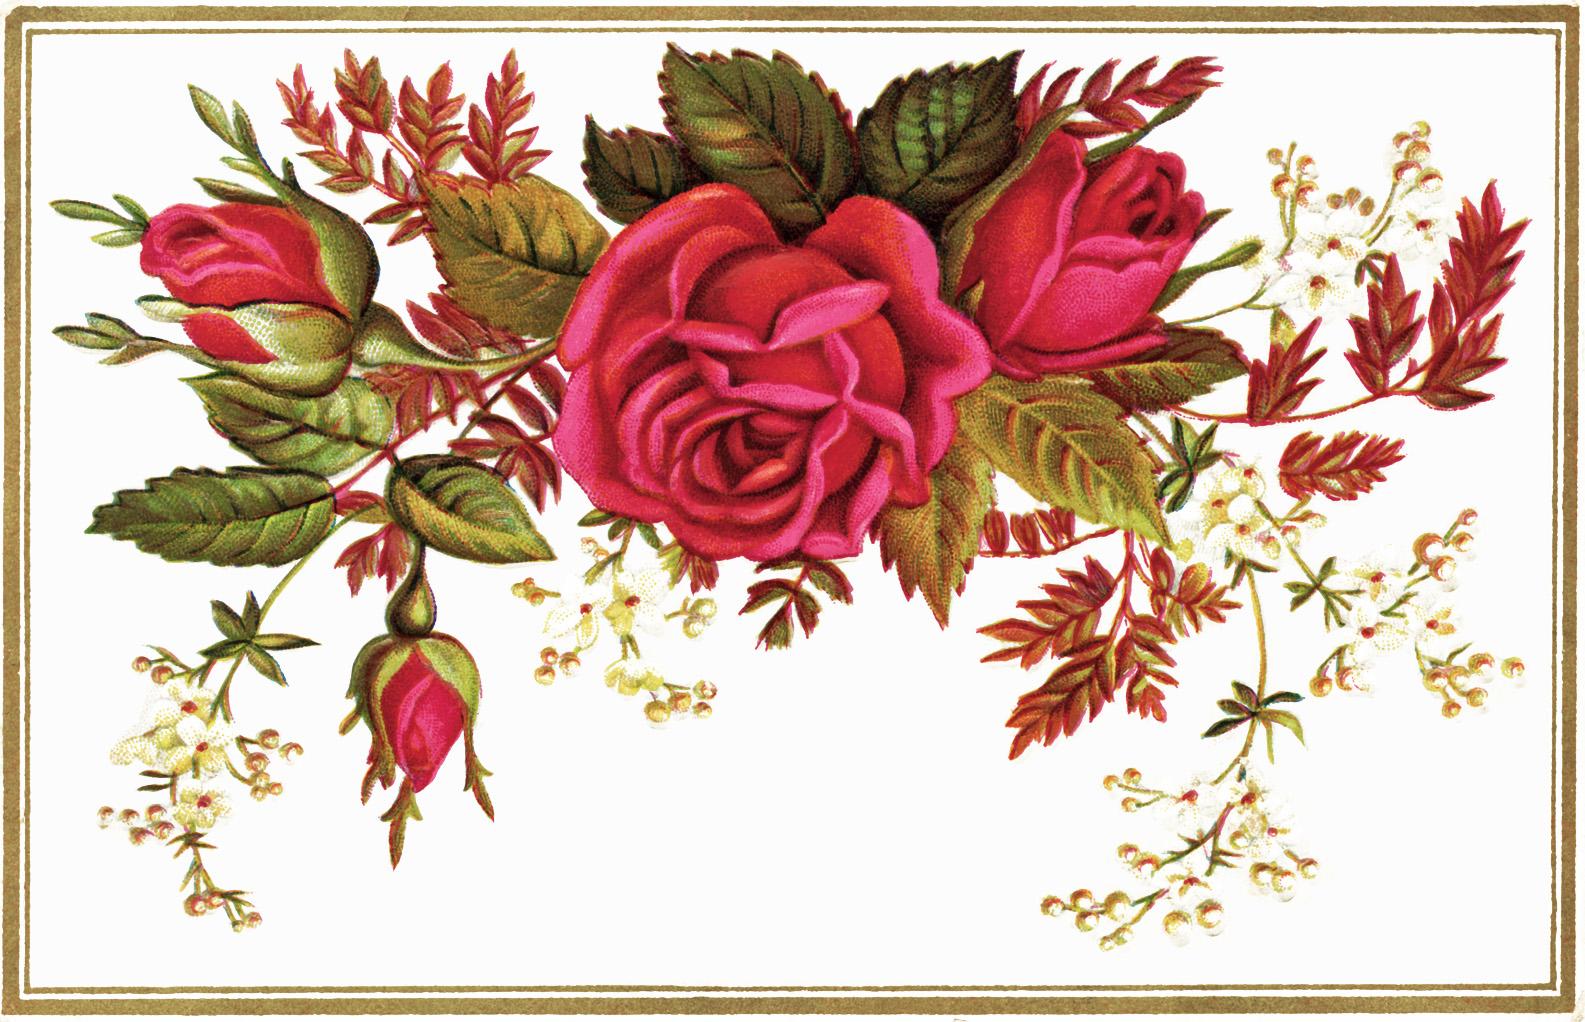 Free Vintage Flower Clip Art Flowers Old-Free Vintage Flower Clip Art Flowers Old Design Shop Blog Image-12